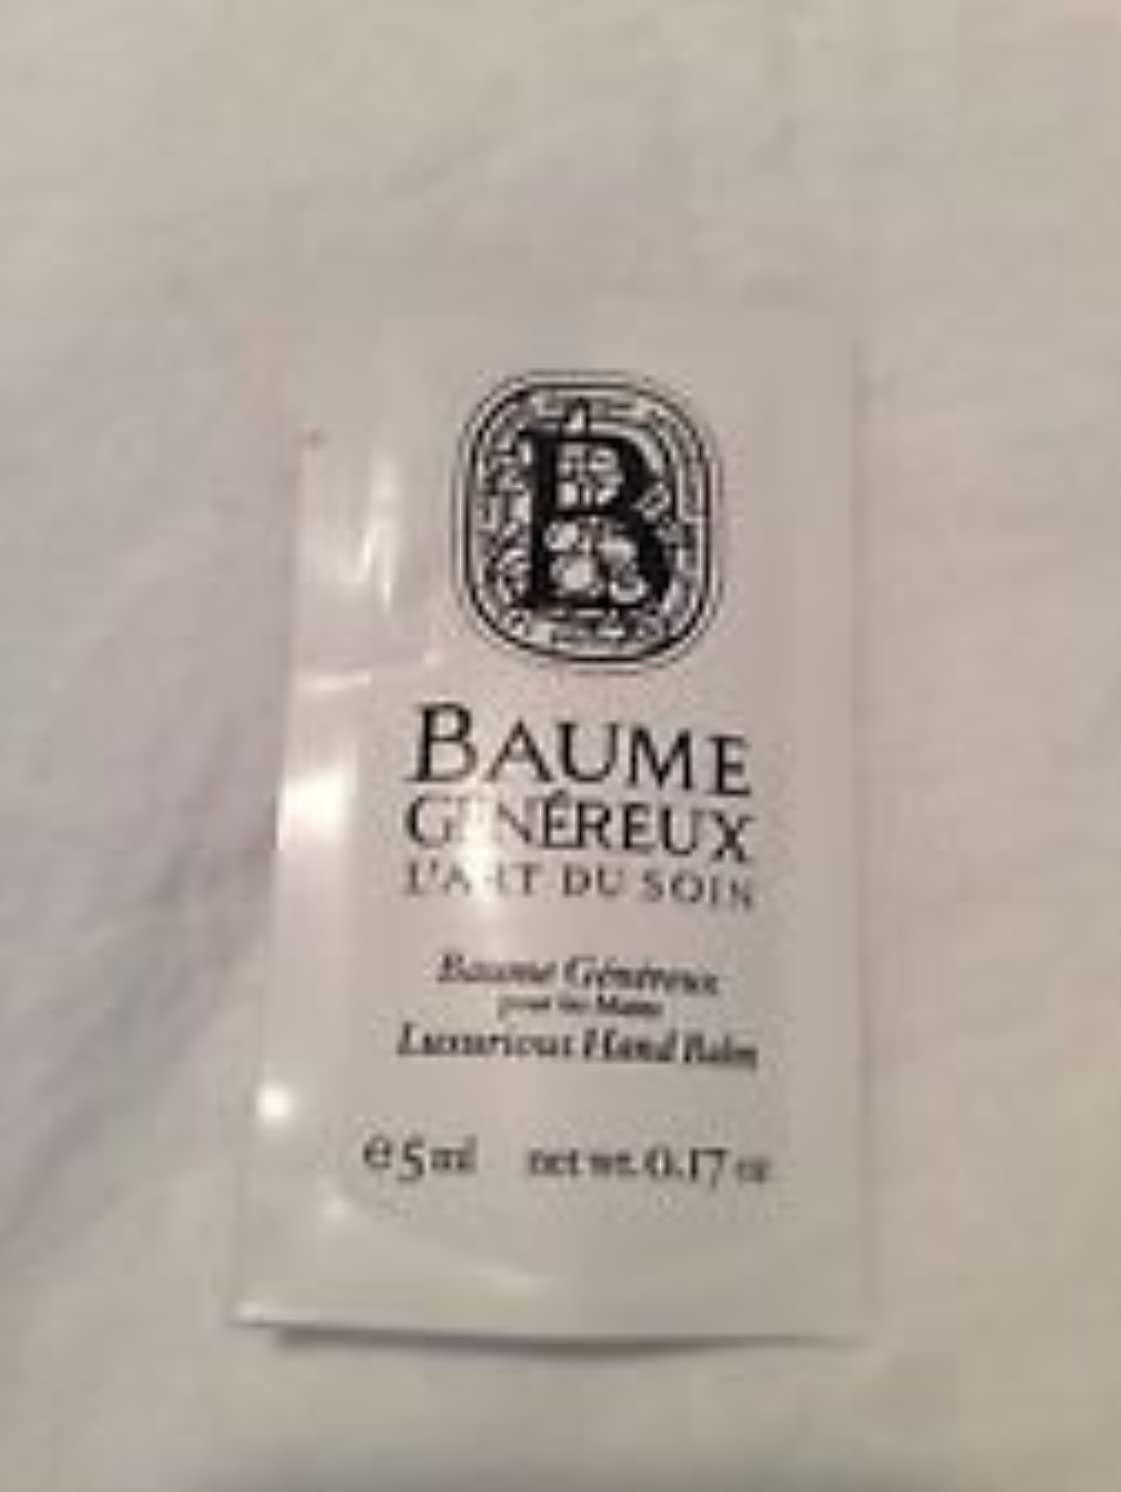 Diptyque Baume Genereux (ディプティック ボーム ジェネリュク) 0.17 oz (5ml) ハンドバルム サンプル for Women